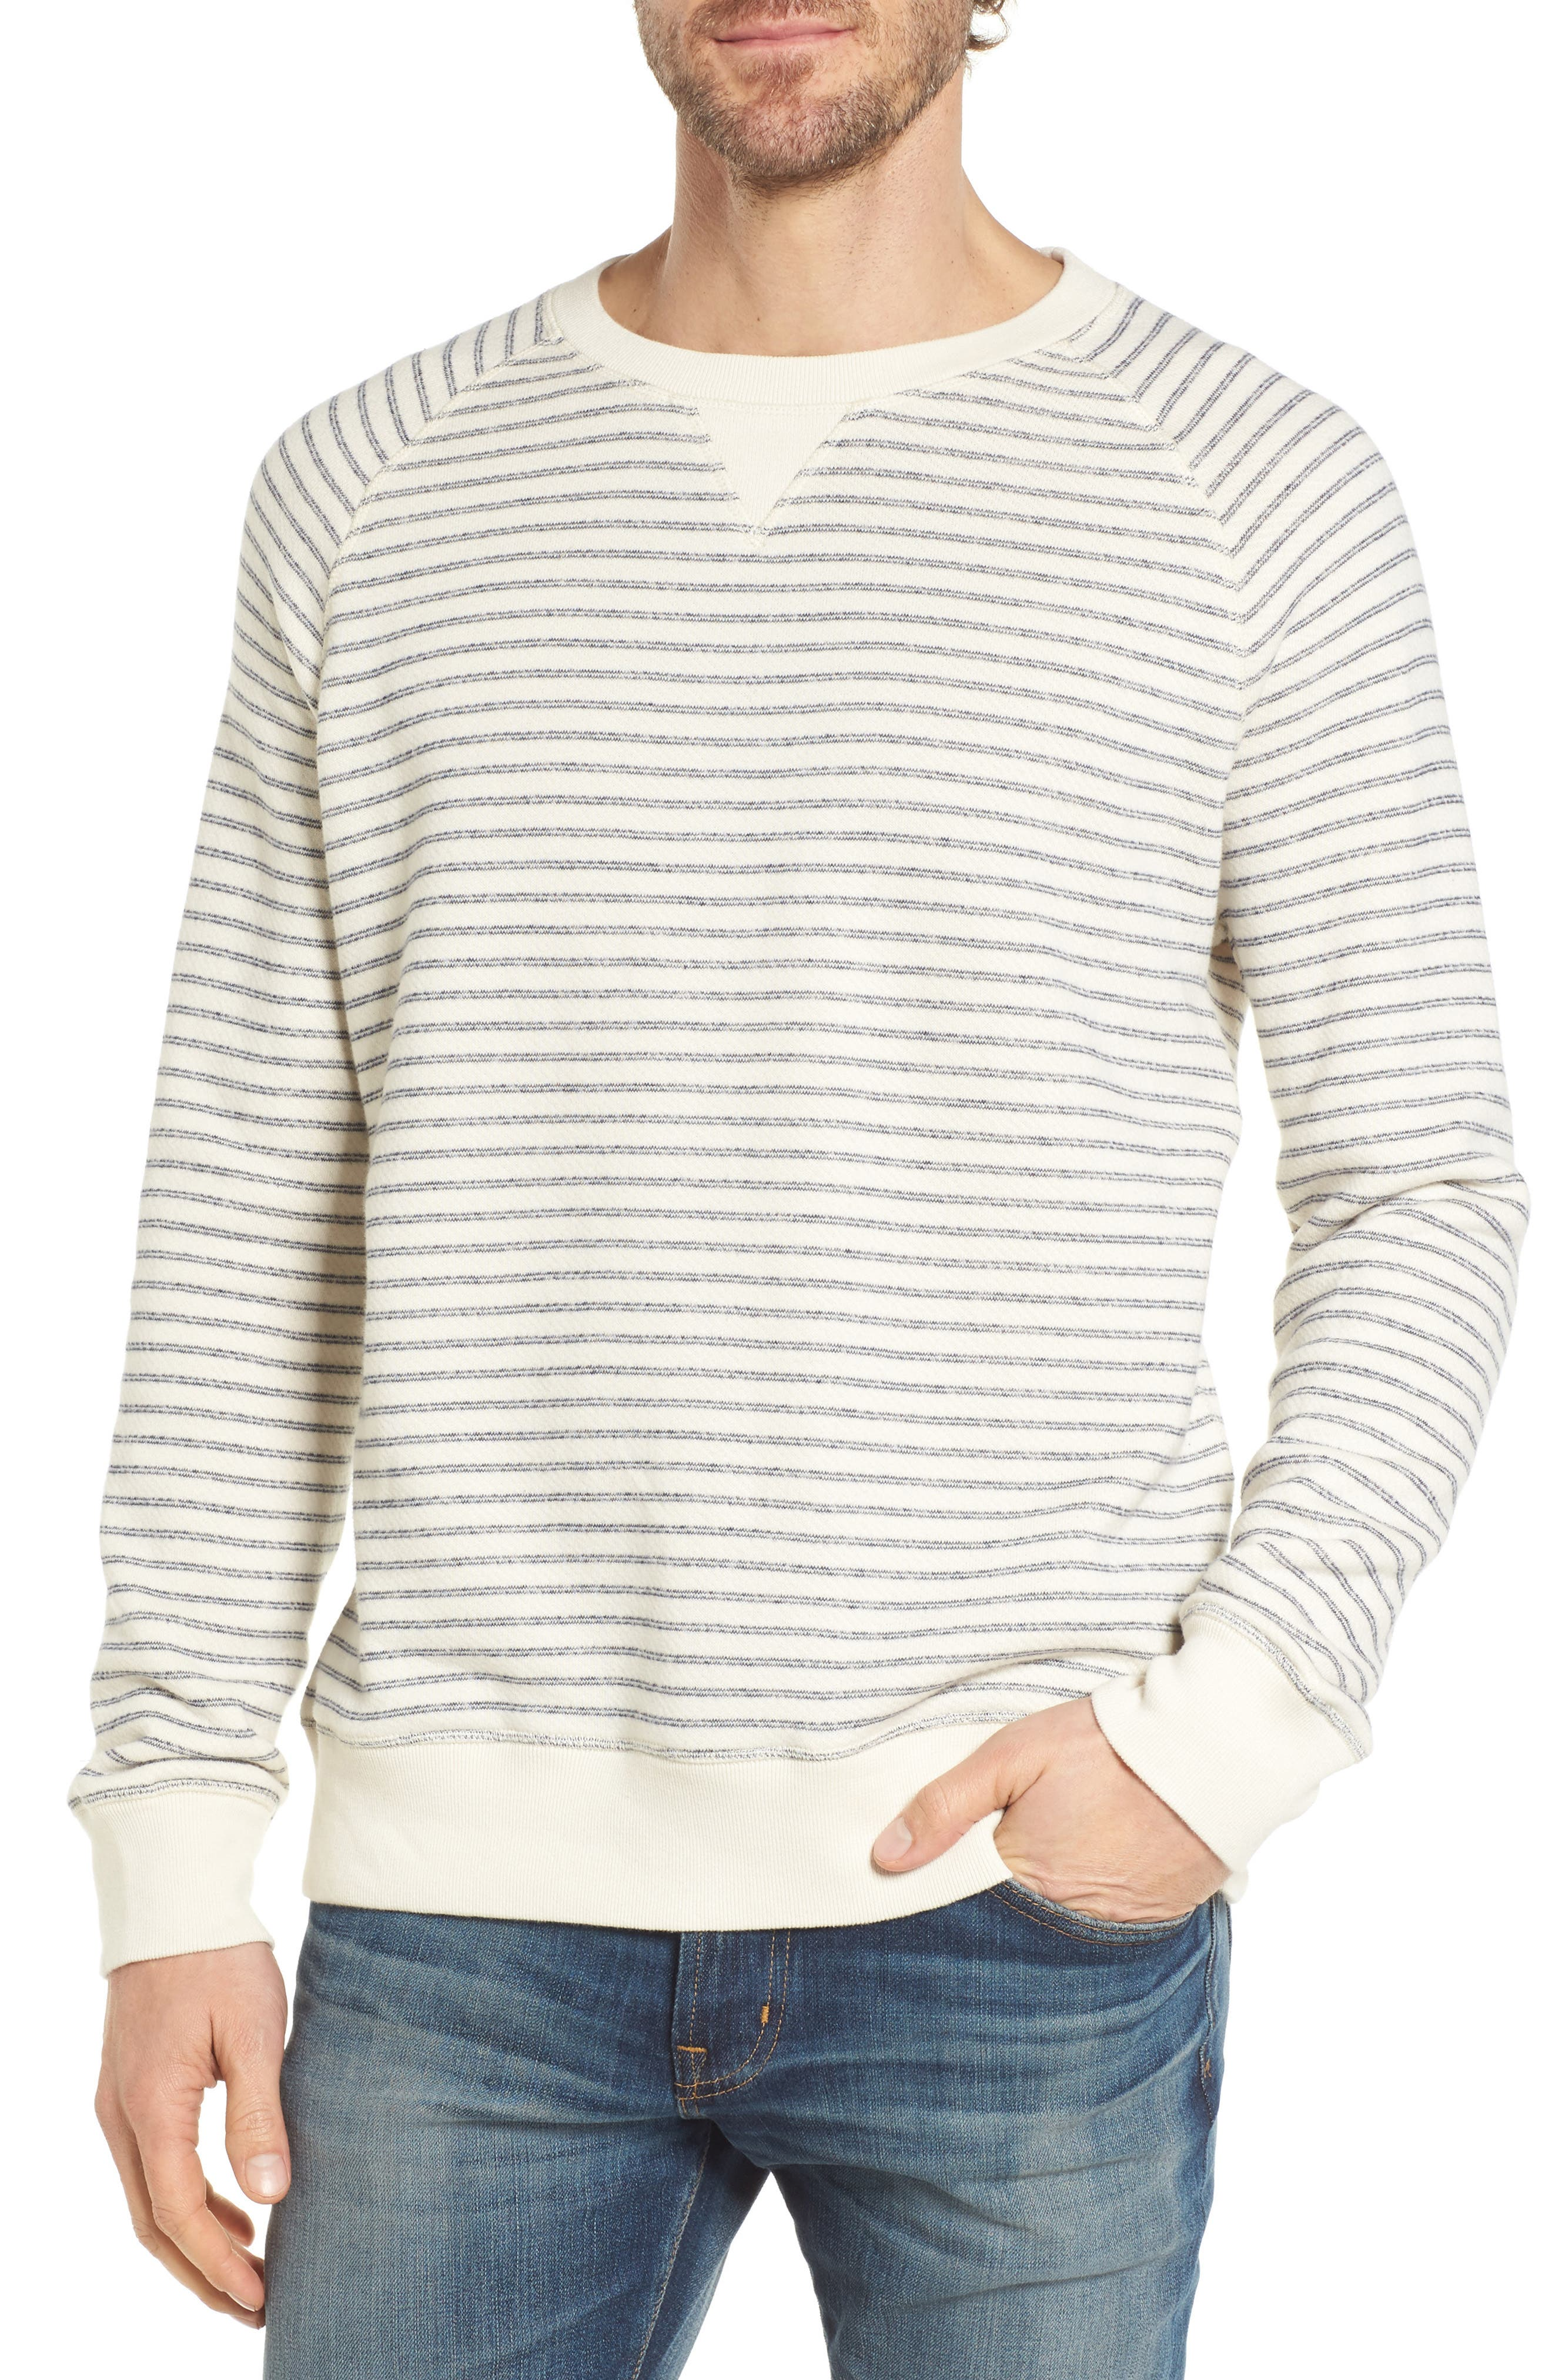 Dalton Stripe Terry Sweatshirt,                         Main,                         color, White/ Navy Stripe